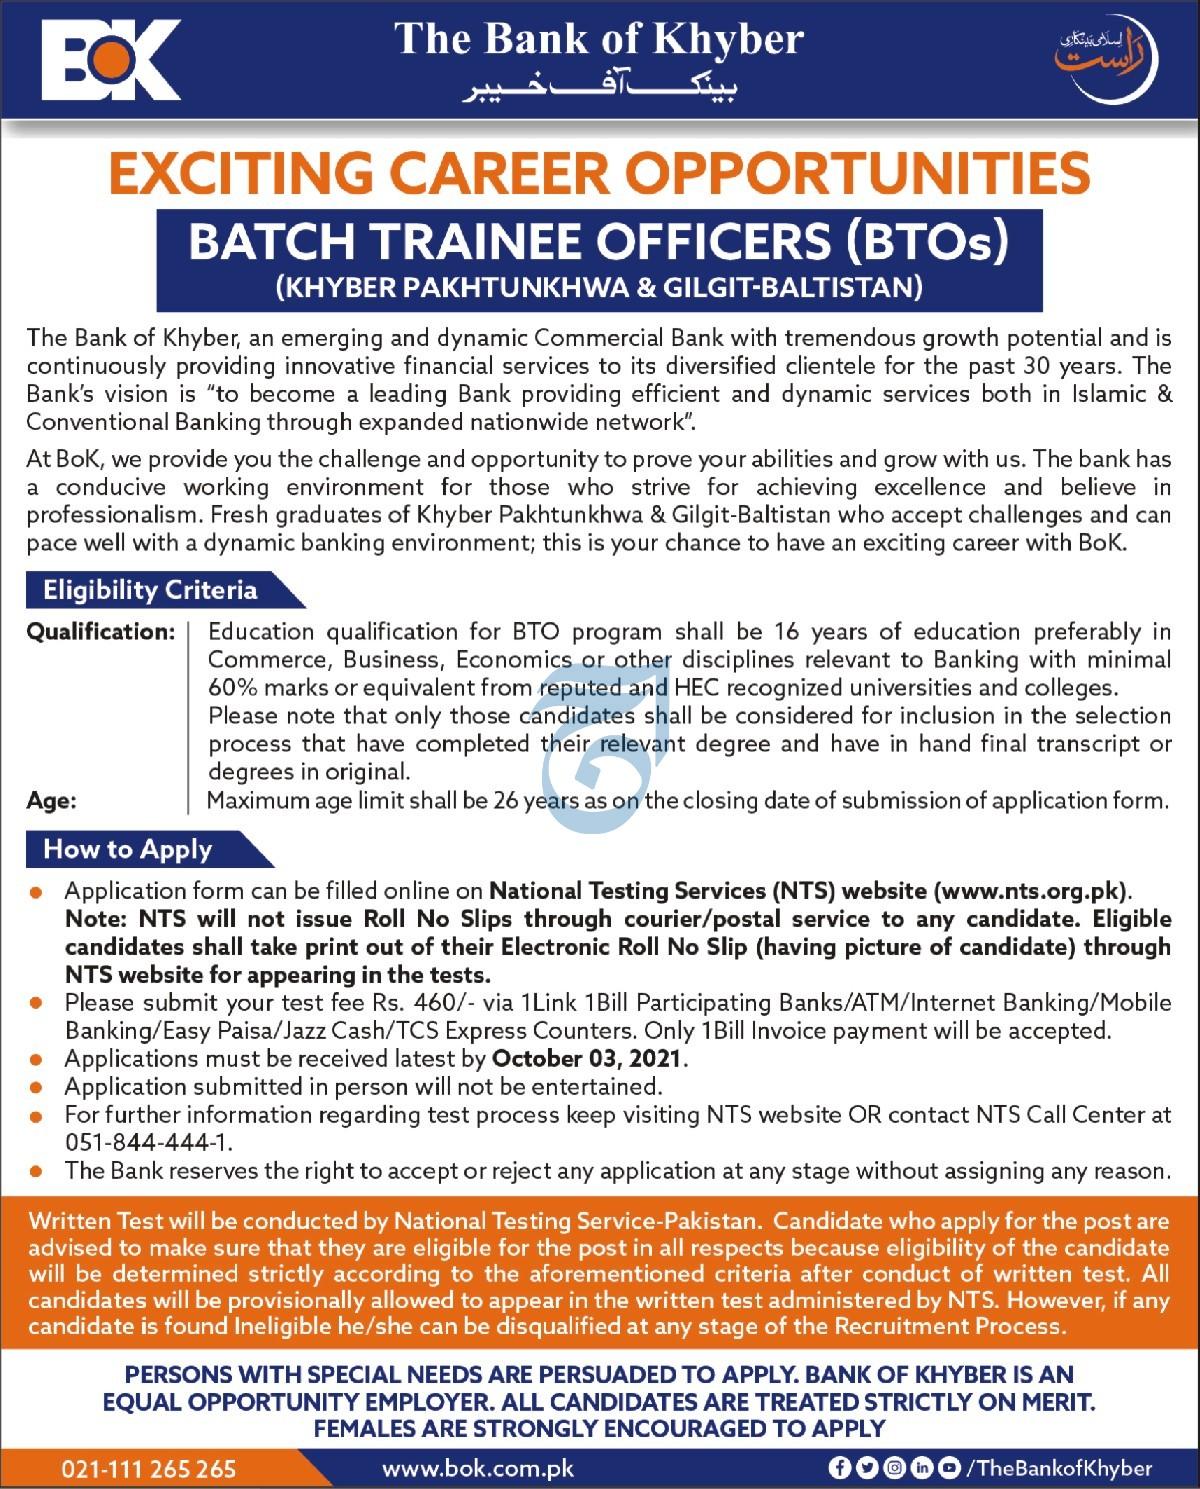 BOK Bank of Khyber Batch Trainee Officers Jobs NTS Roll No Slip